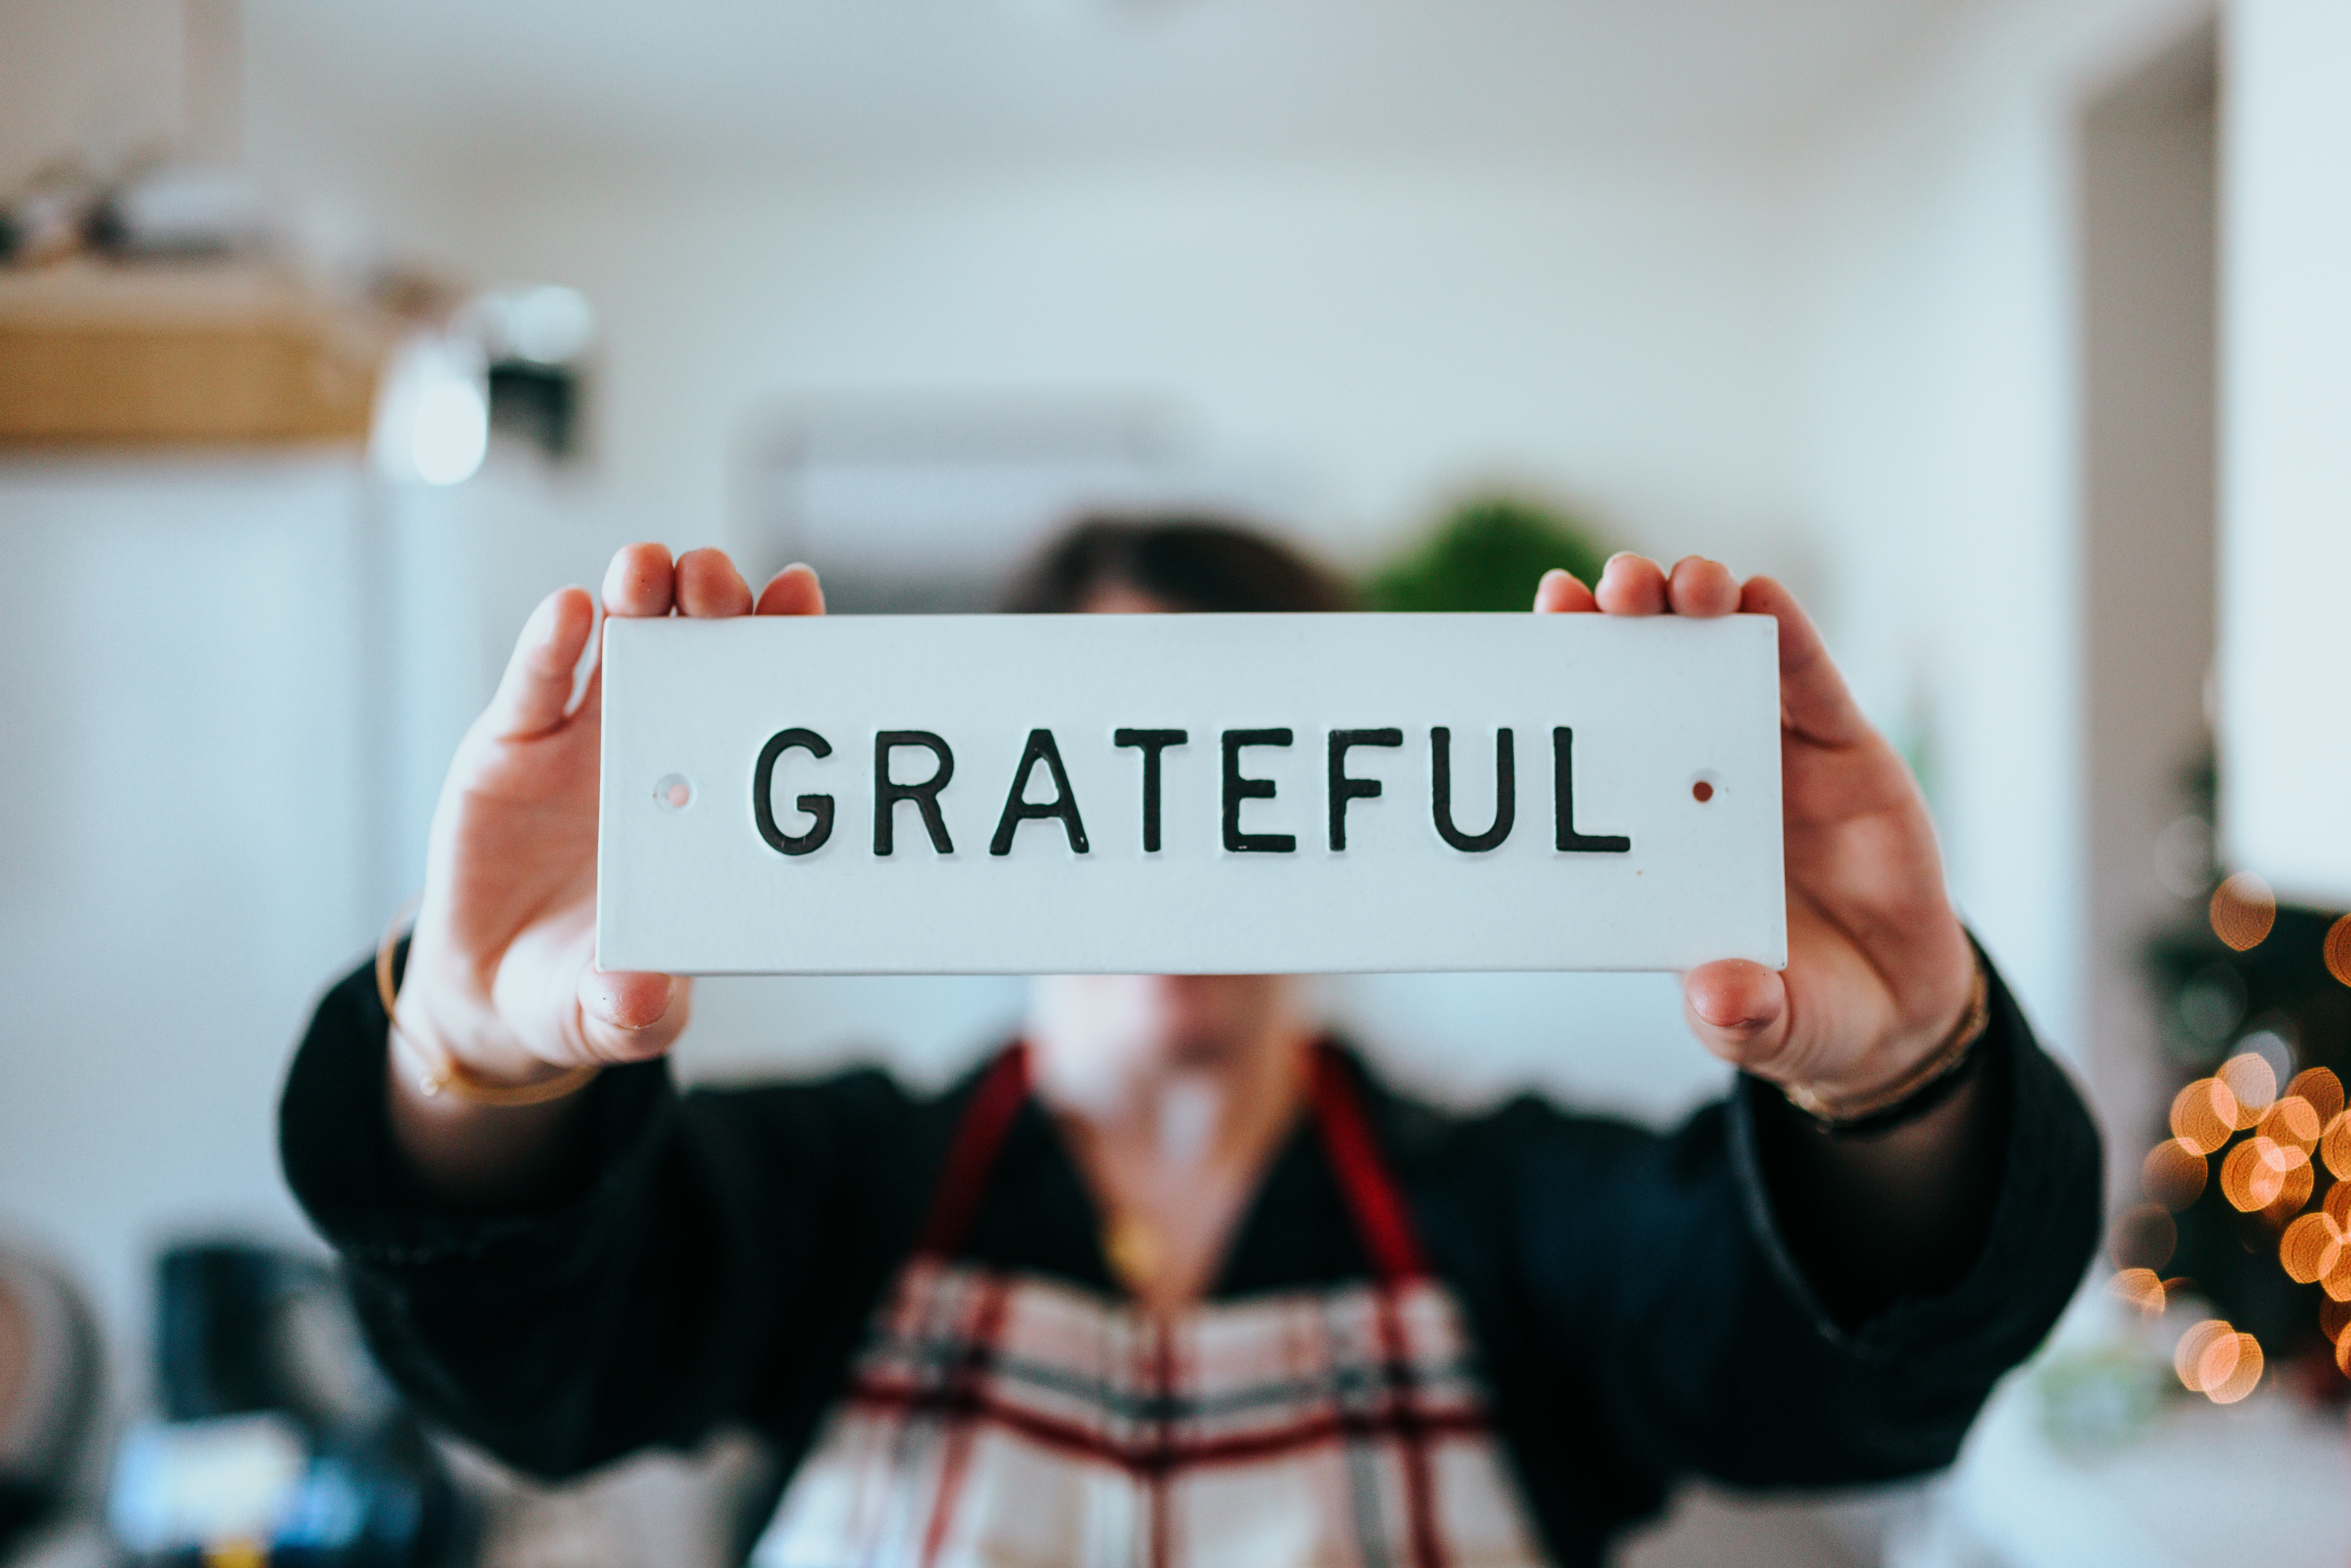 Gratitude is an attitude, according to Sarah Marshank.